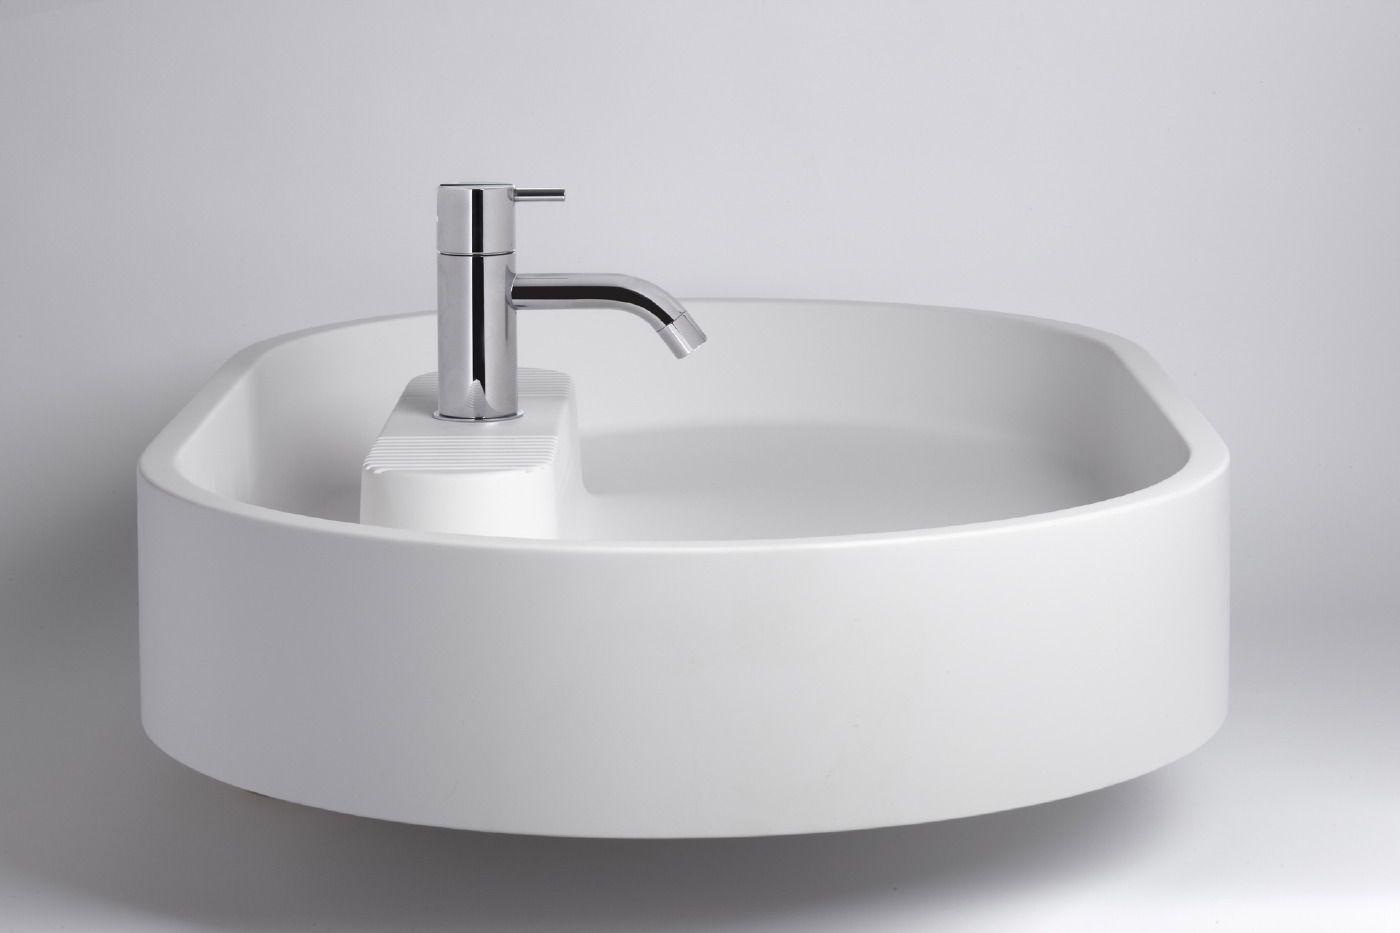 Wilmotte & Associés - _STB5157.JPG | Home // Kitchen & Bathroom ...